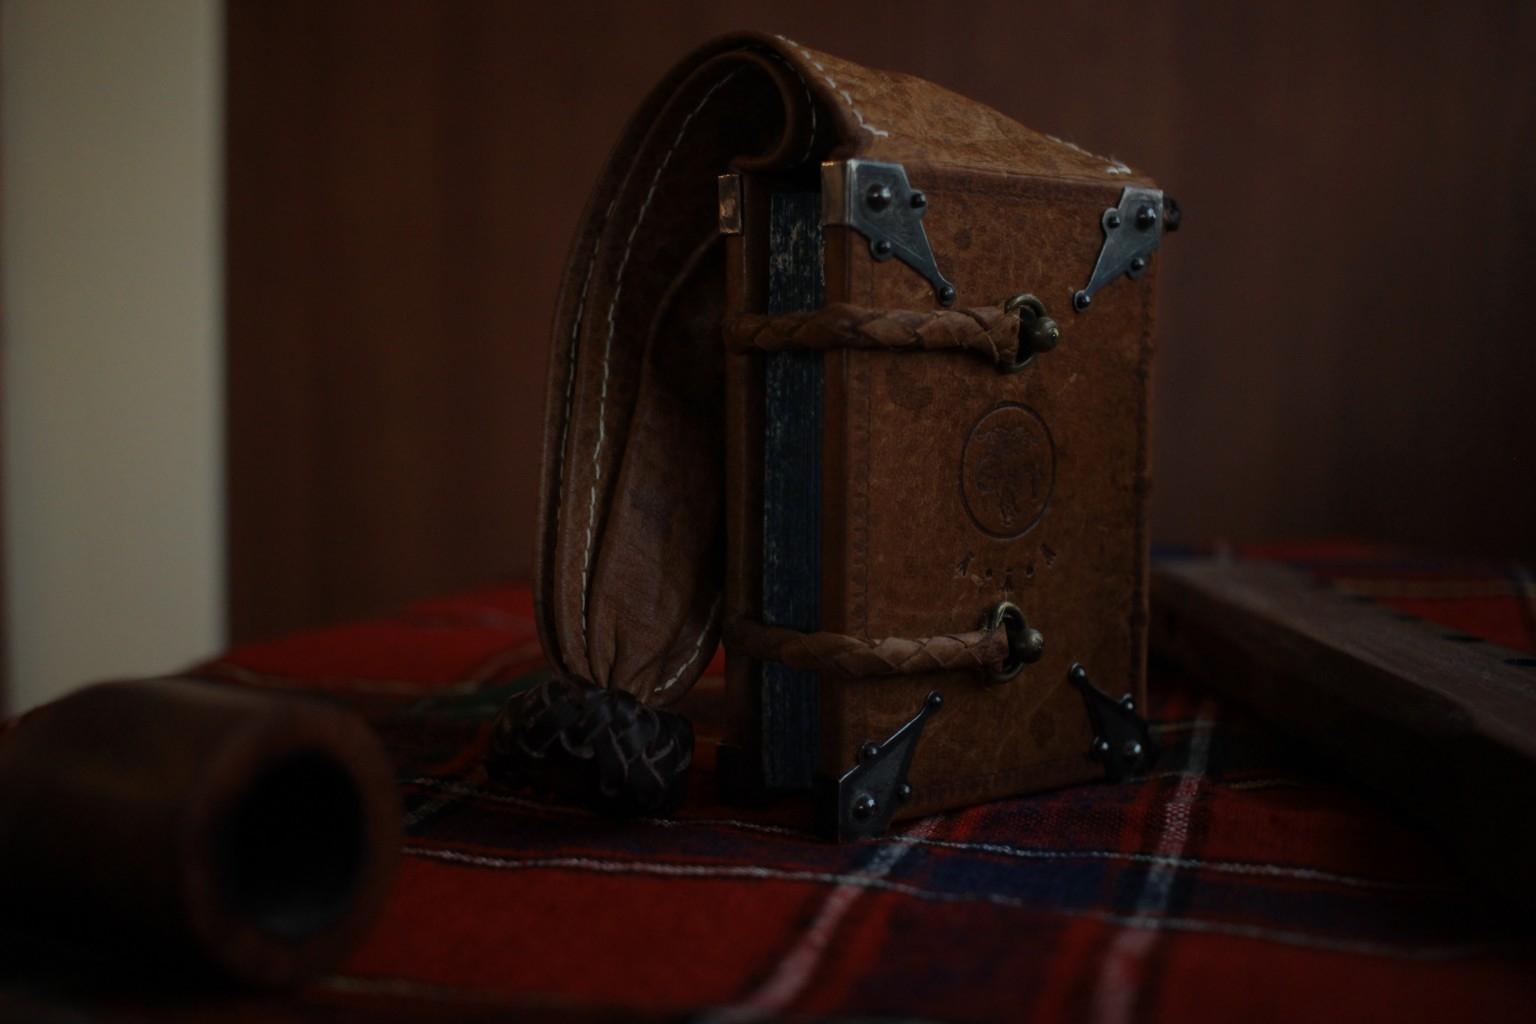 книговезец стопан тефтер занаят книговезане майстор занаятчия